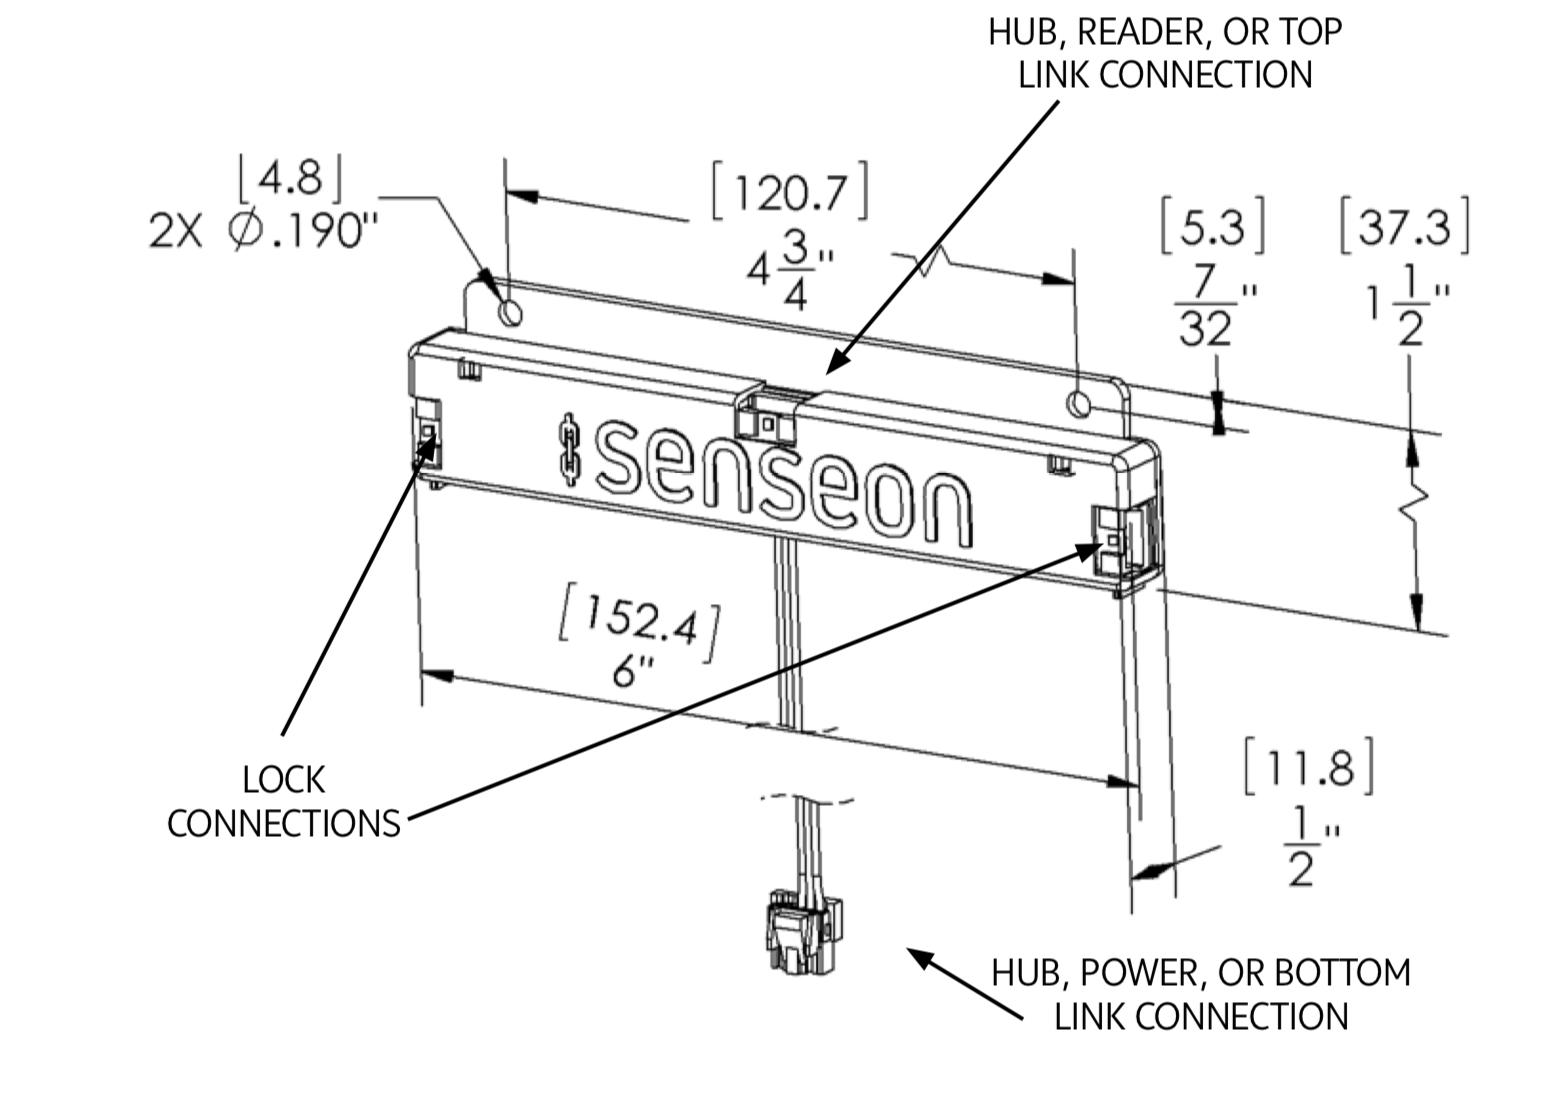 Senseon-Secure-Locking-System-Hub